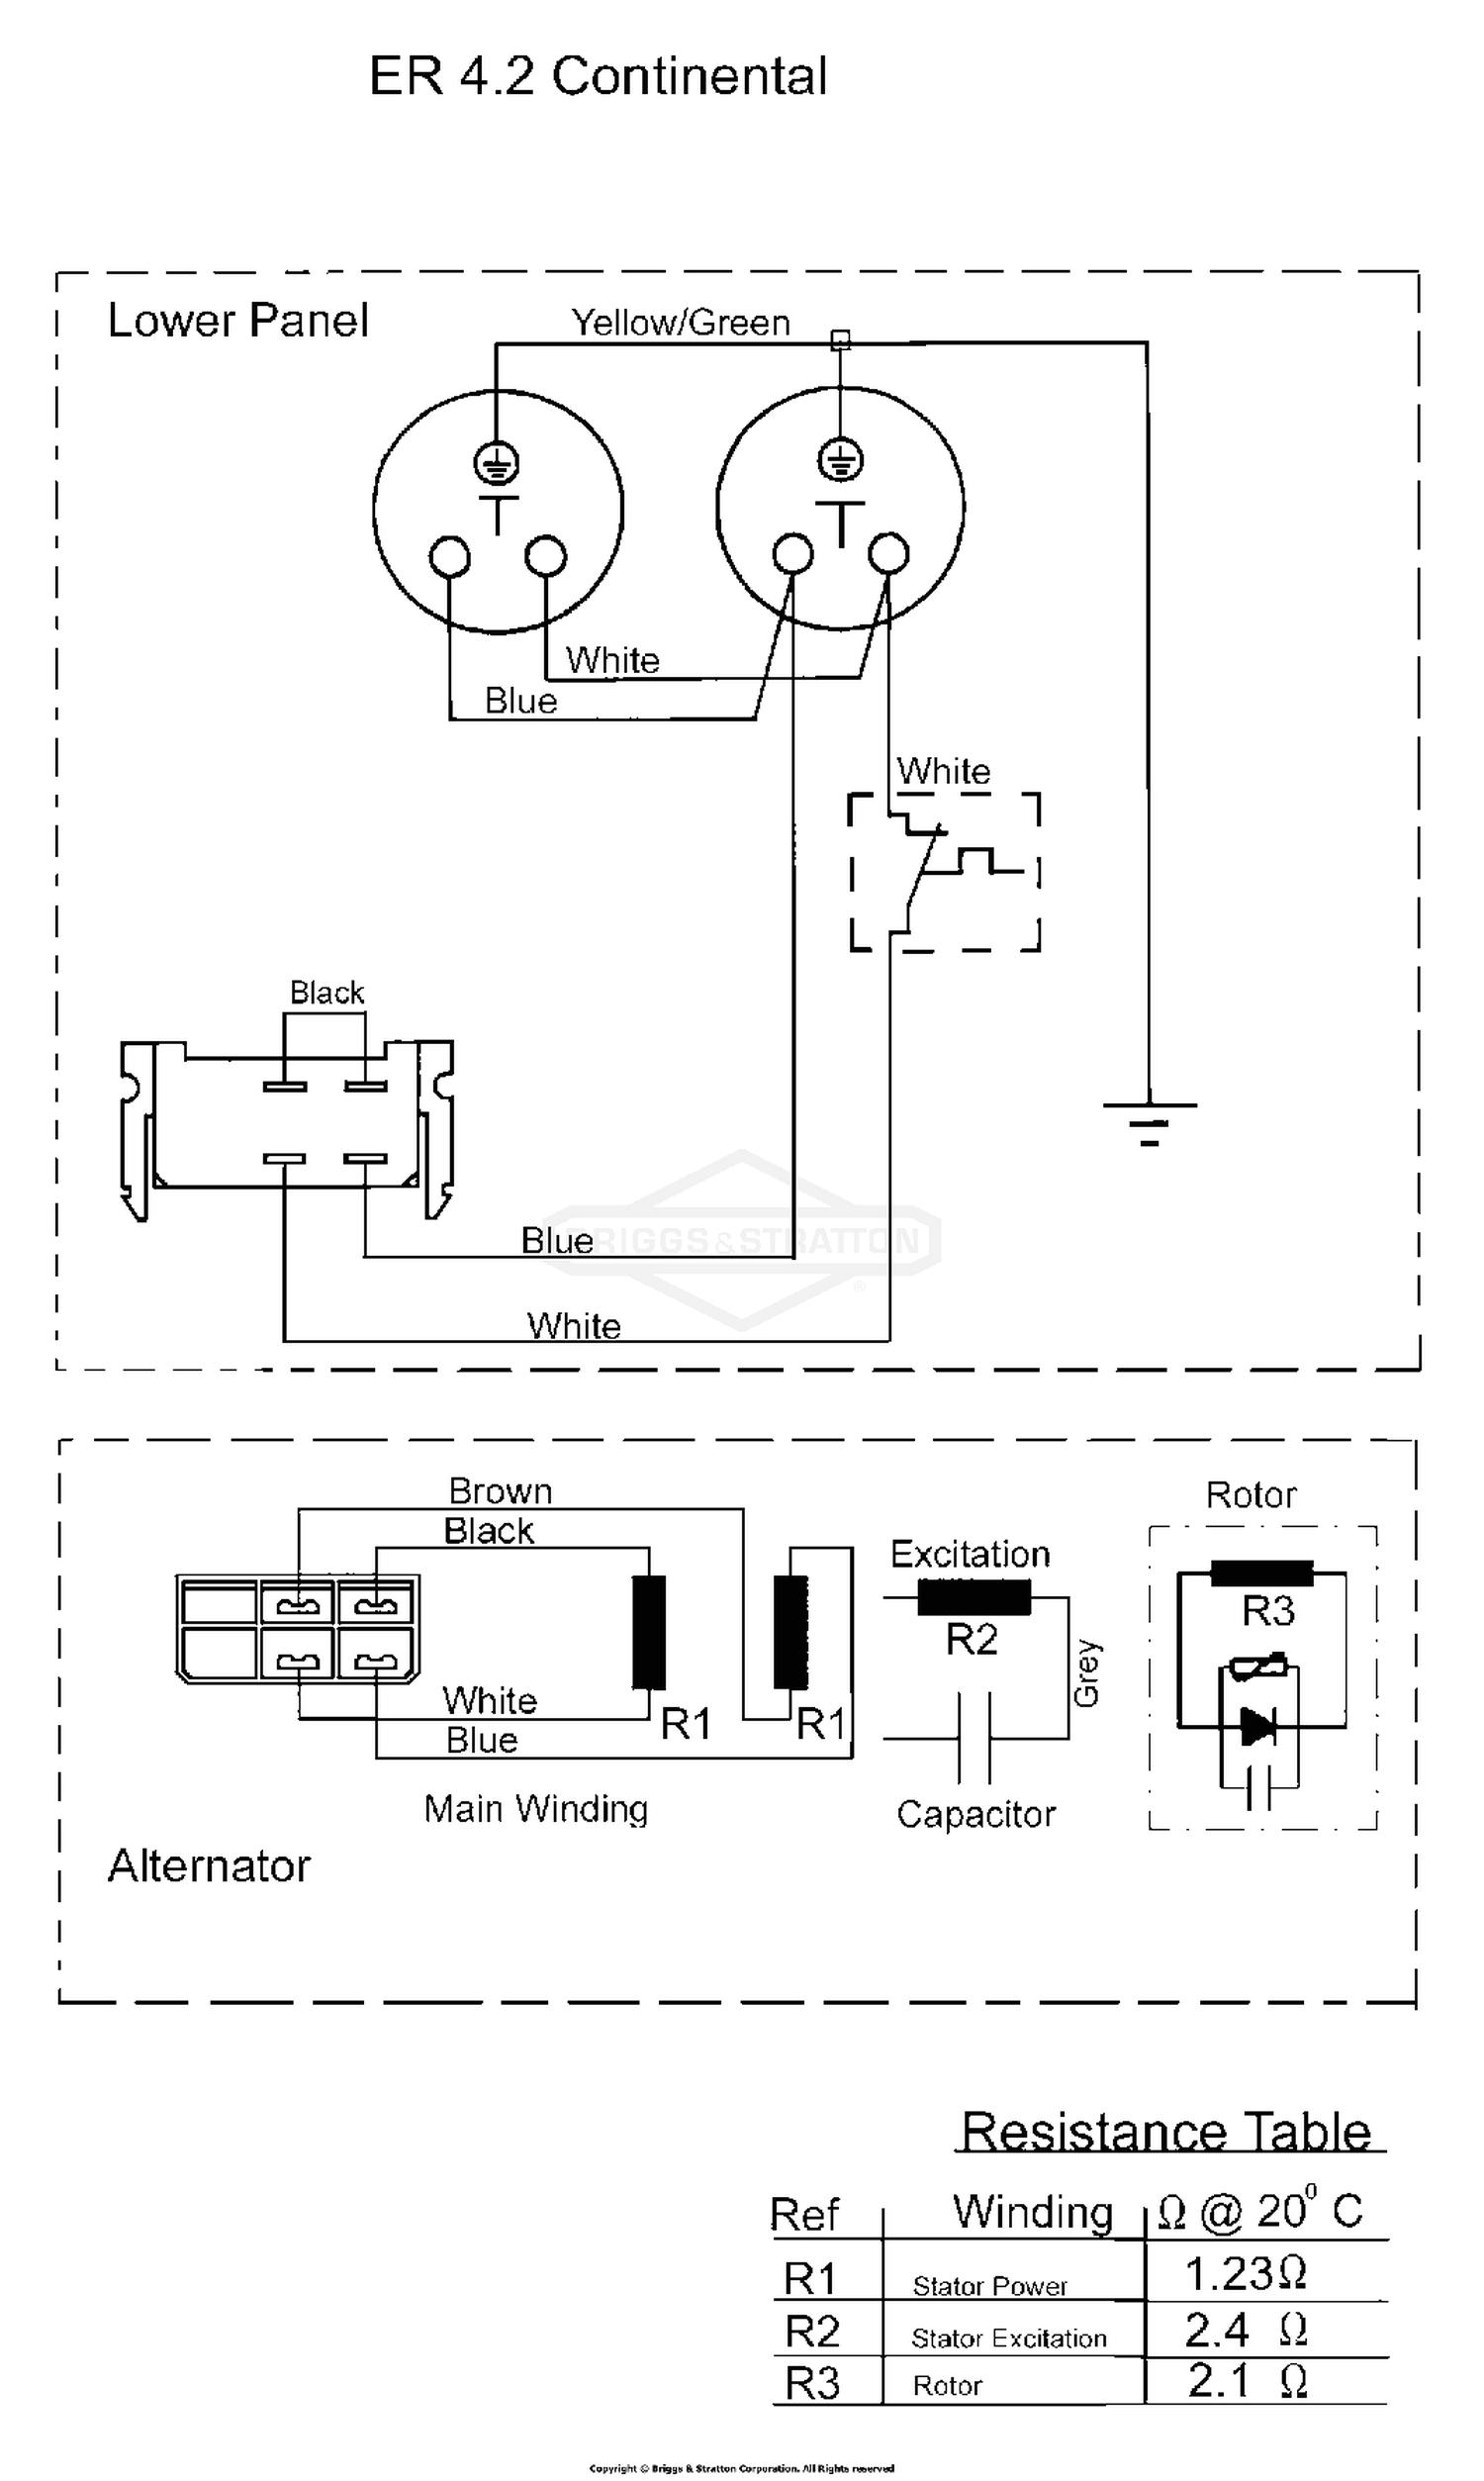 briggs amp stratton power products del 26072017021729 030300 0 jpg